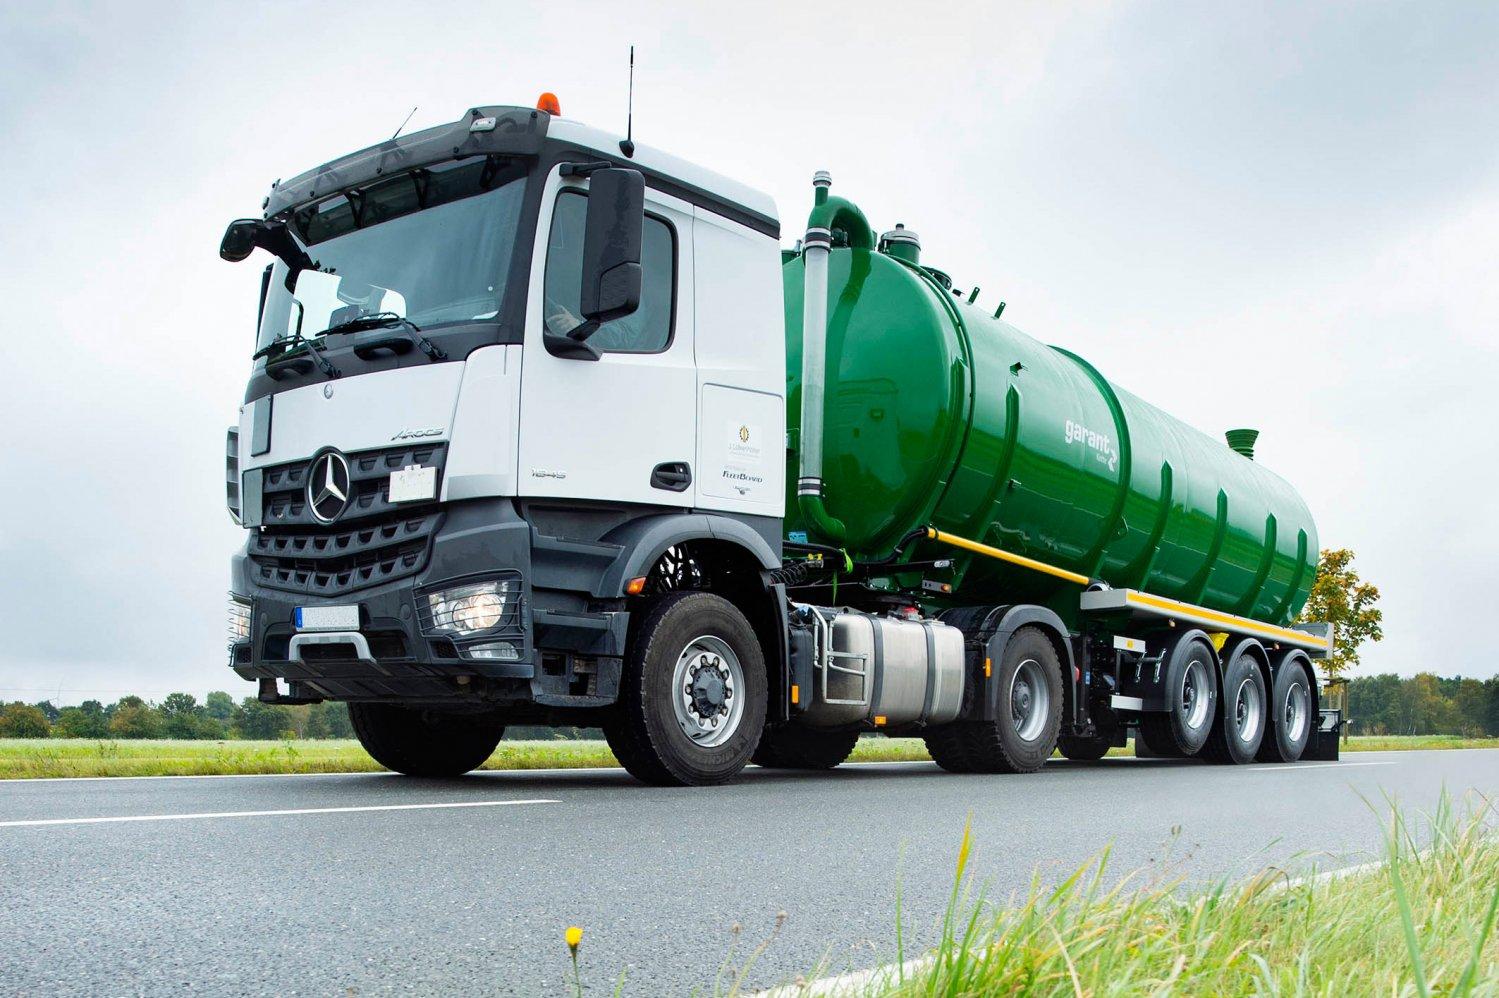 Tanksattelauflieger-gülle-transport-5.jpg